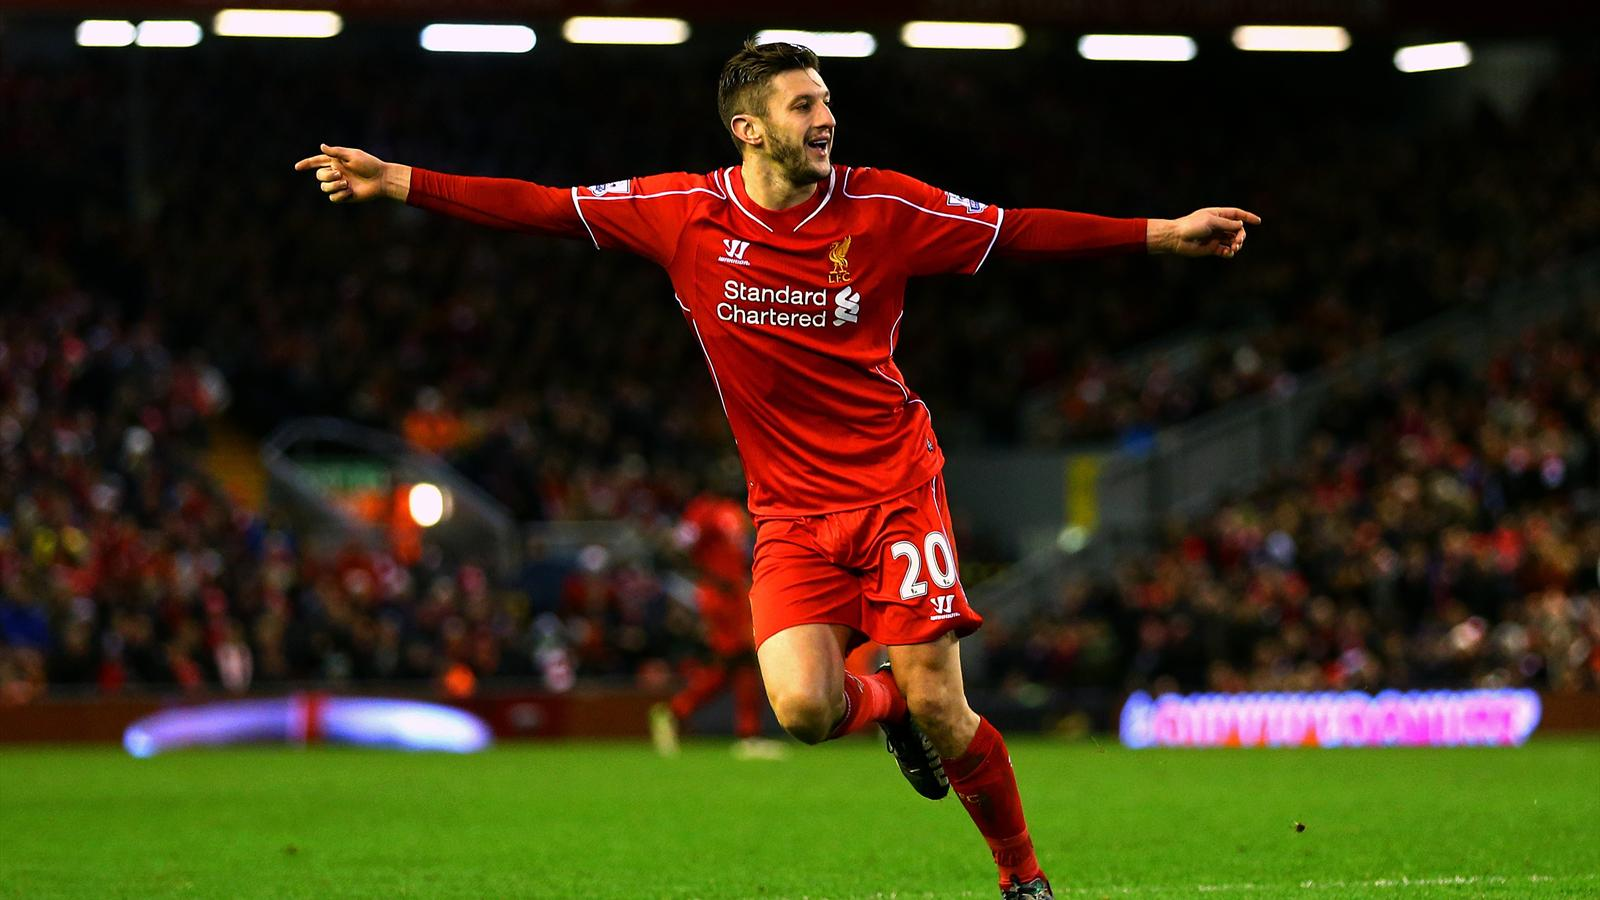 Adam Lallana Hits Brace As Liverpool Thrash Swansea